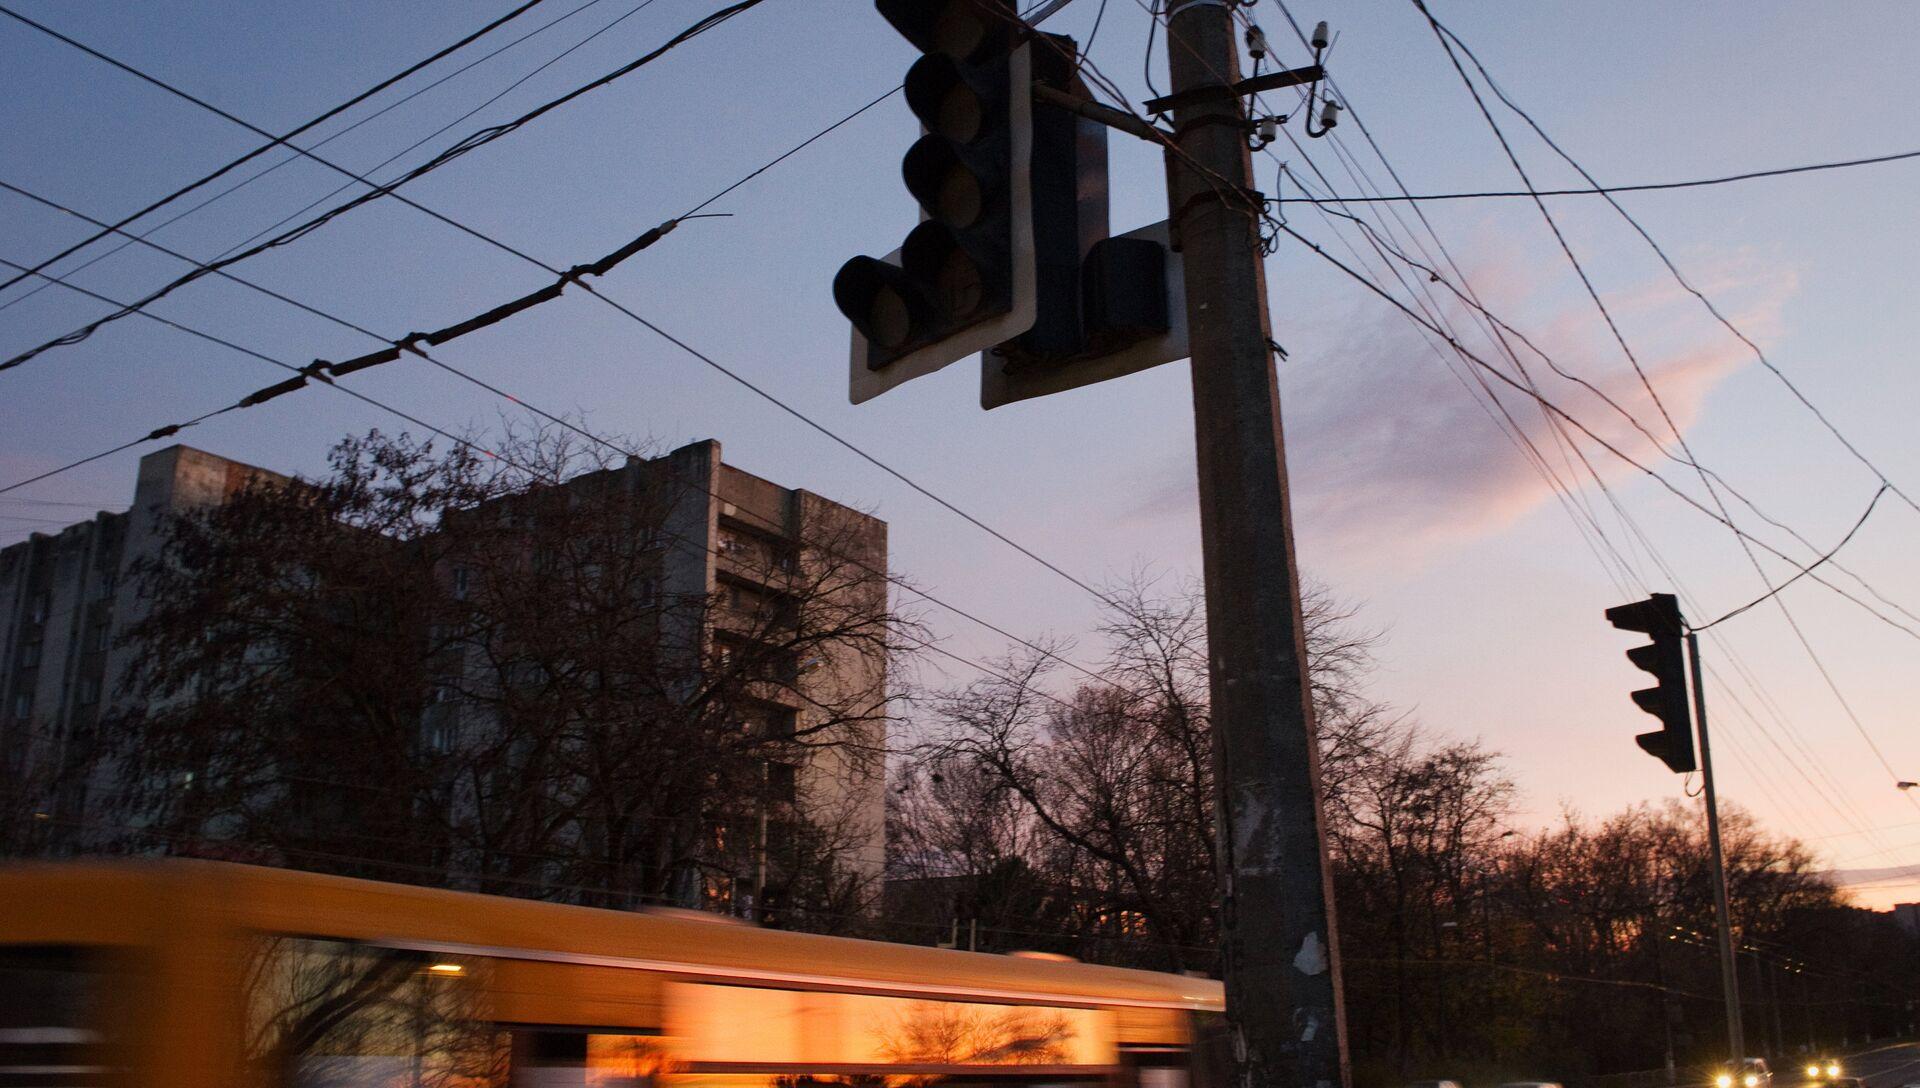 Ситуация с энергоснабжение Крыма - РИА Новости, 1920, 27.11.2015